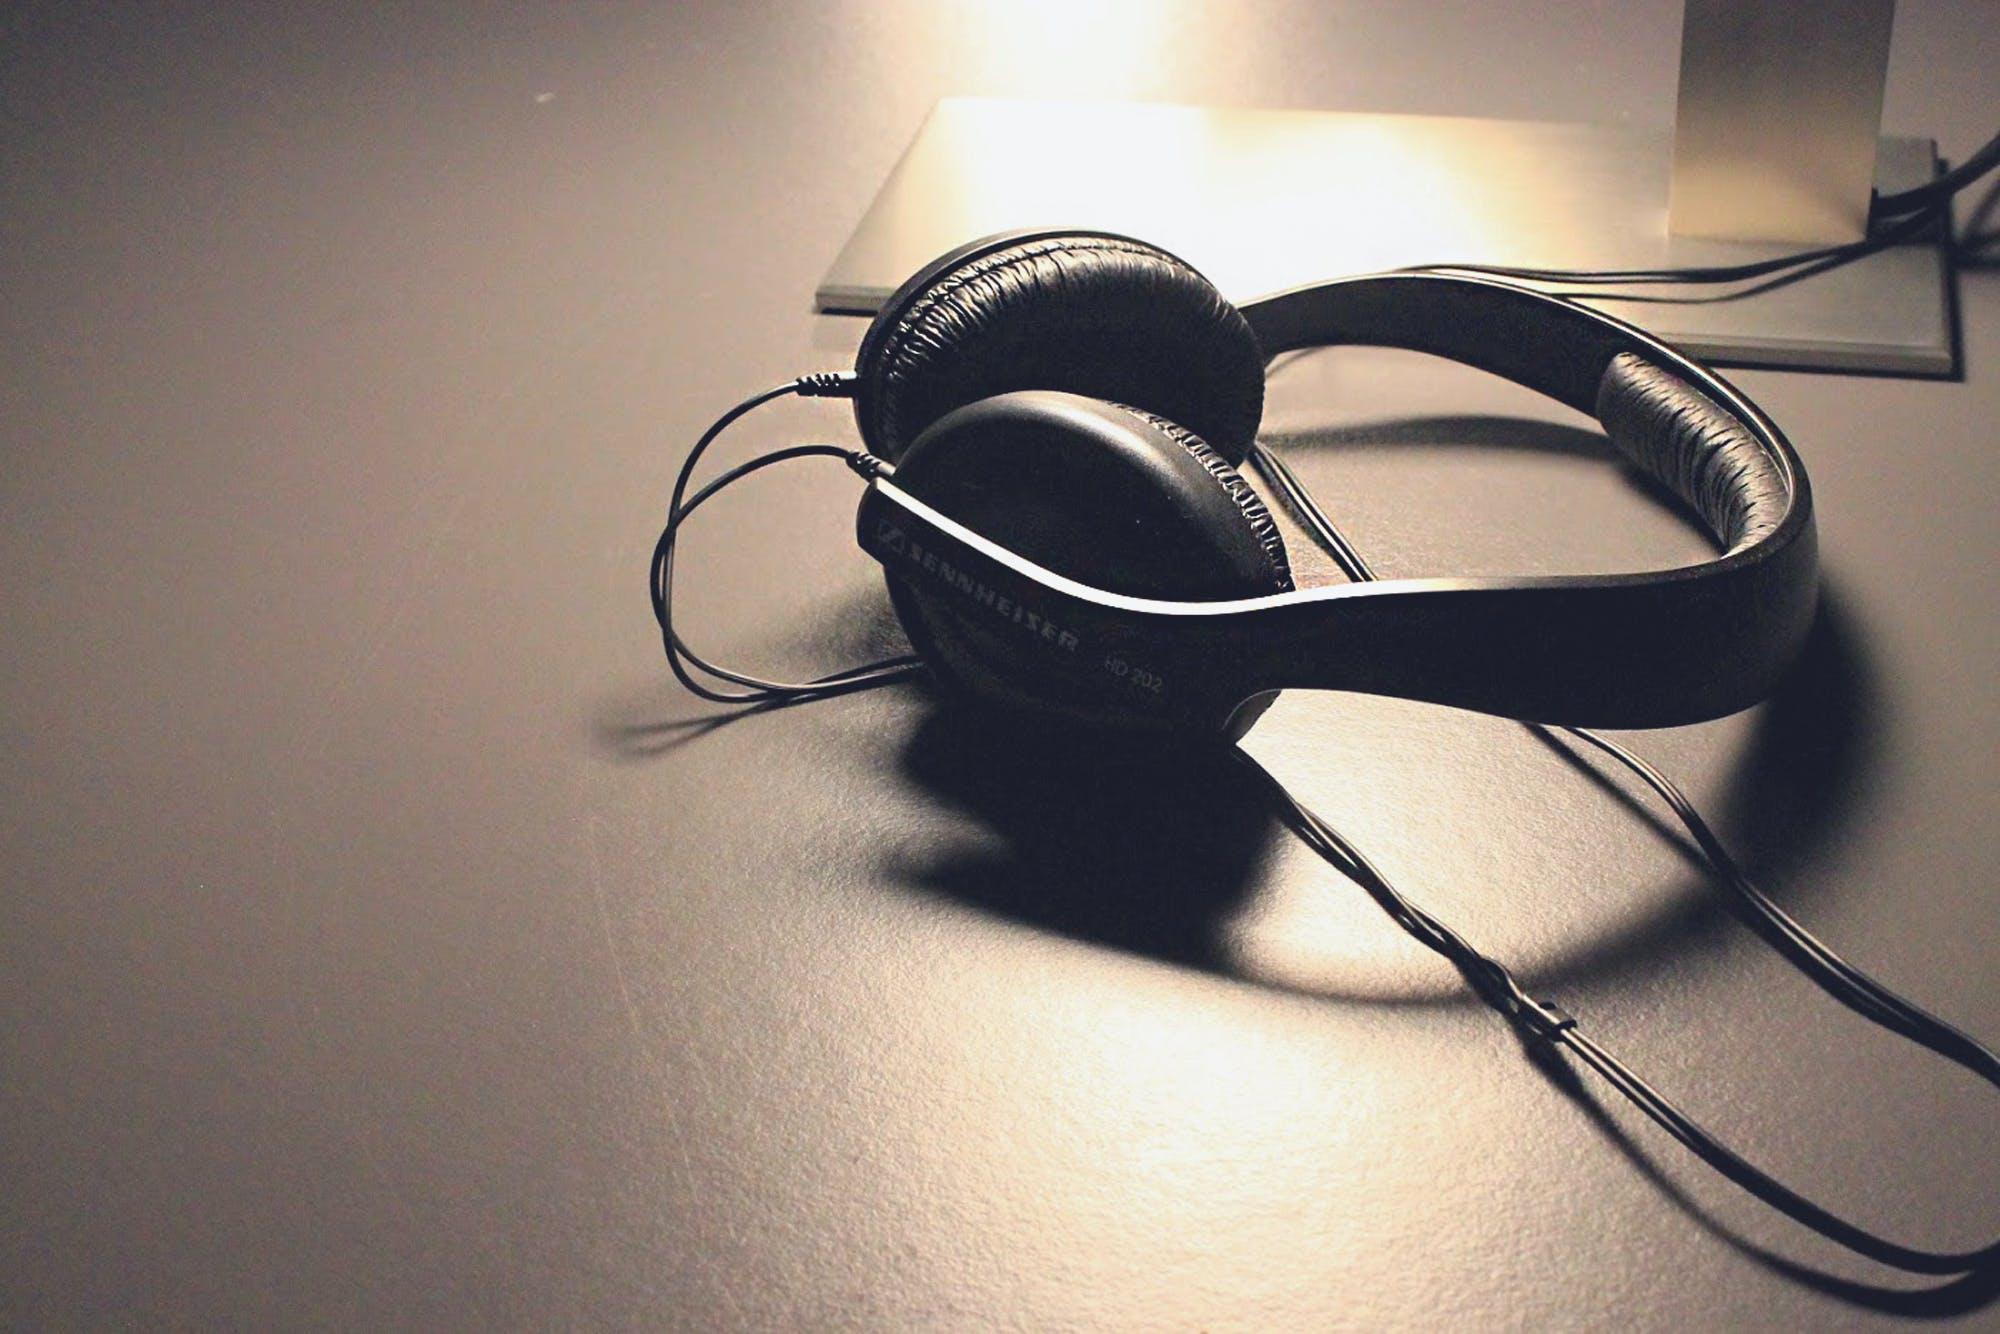 Free stock photo of desk, technology, music, sound